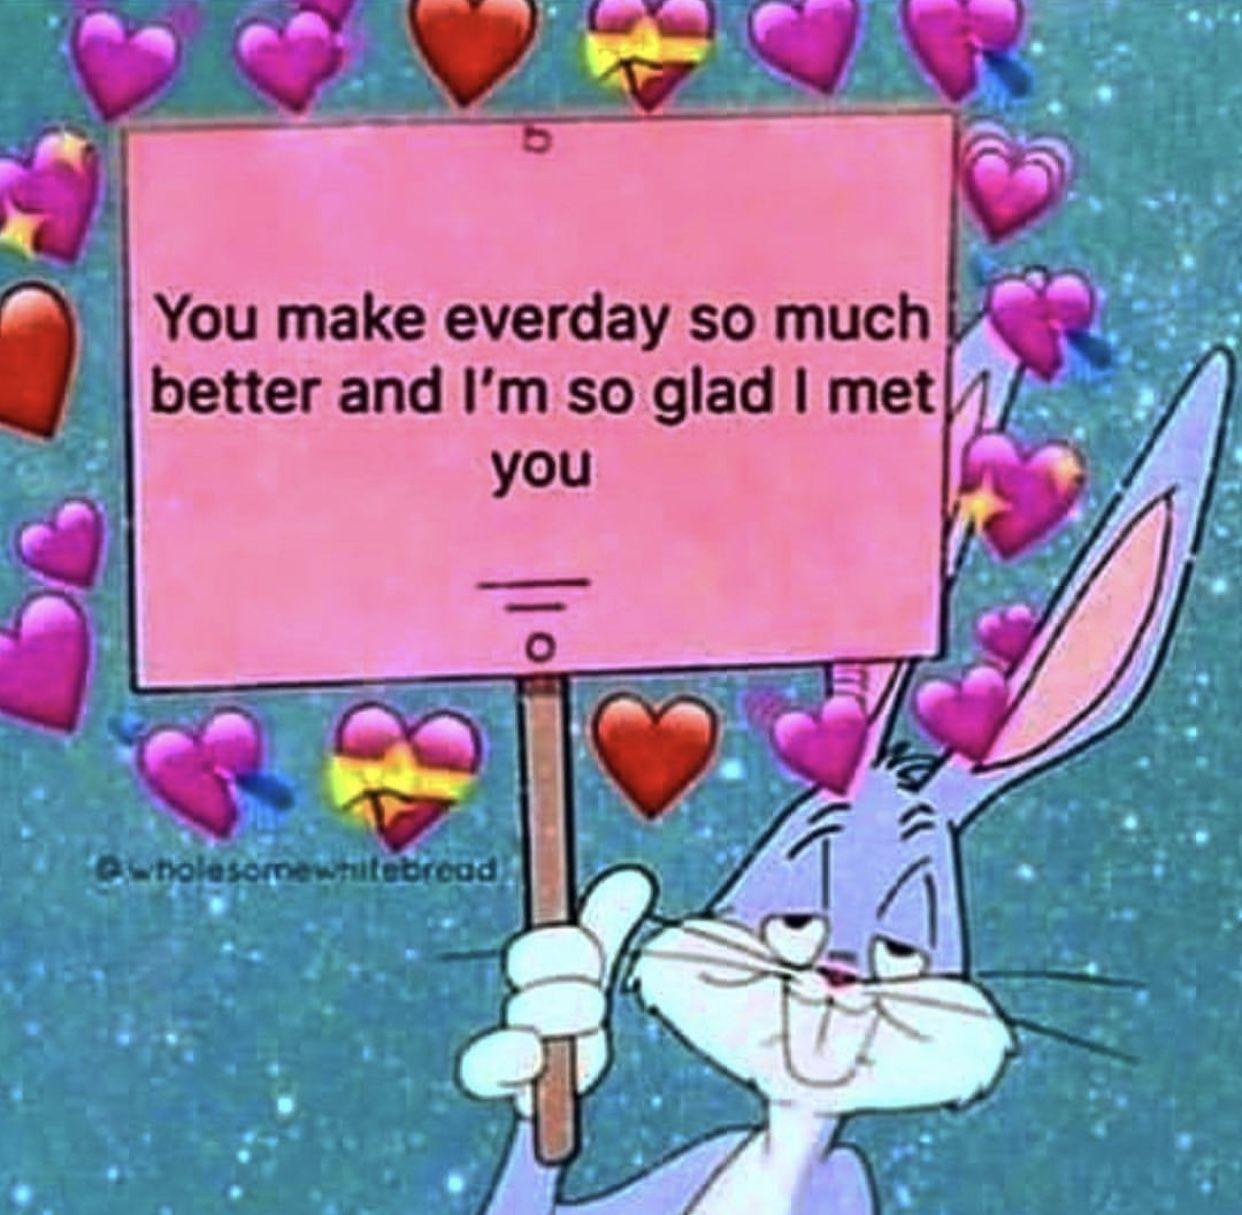 Pin By Rululu On Memes Cute Love Memes Cute Memes Wholesome Memes